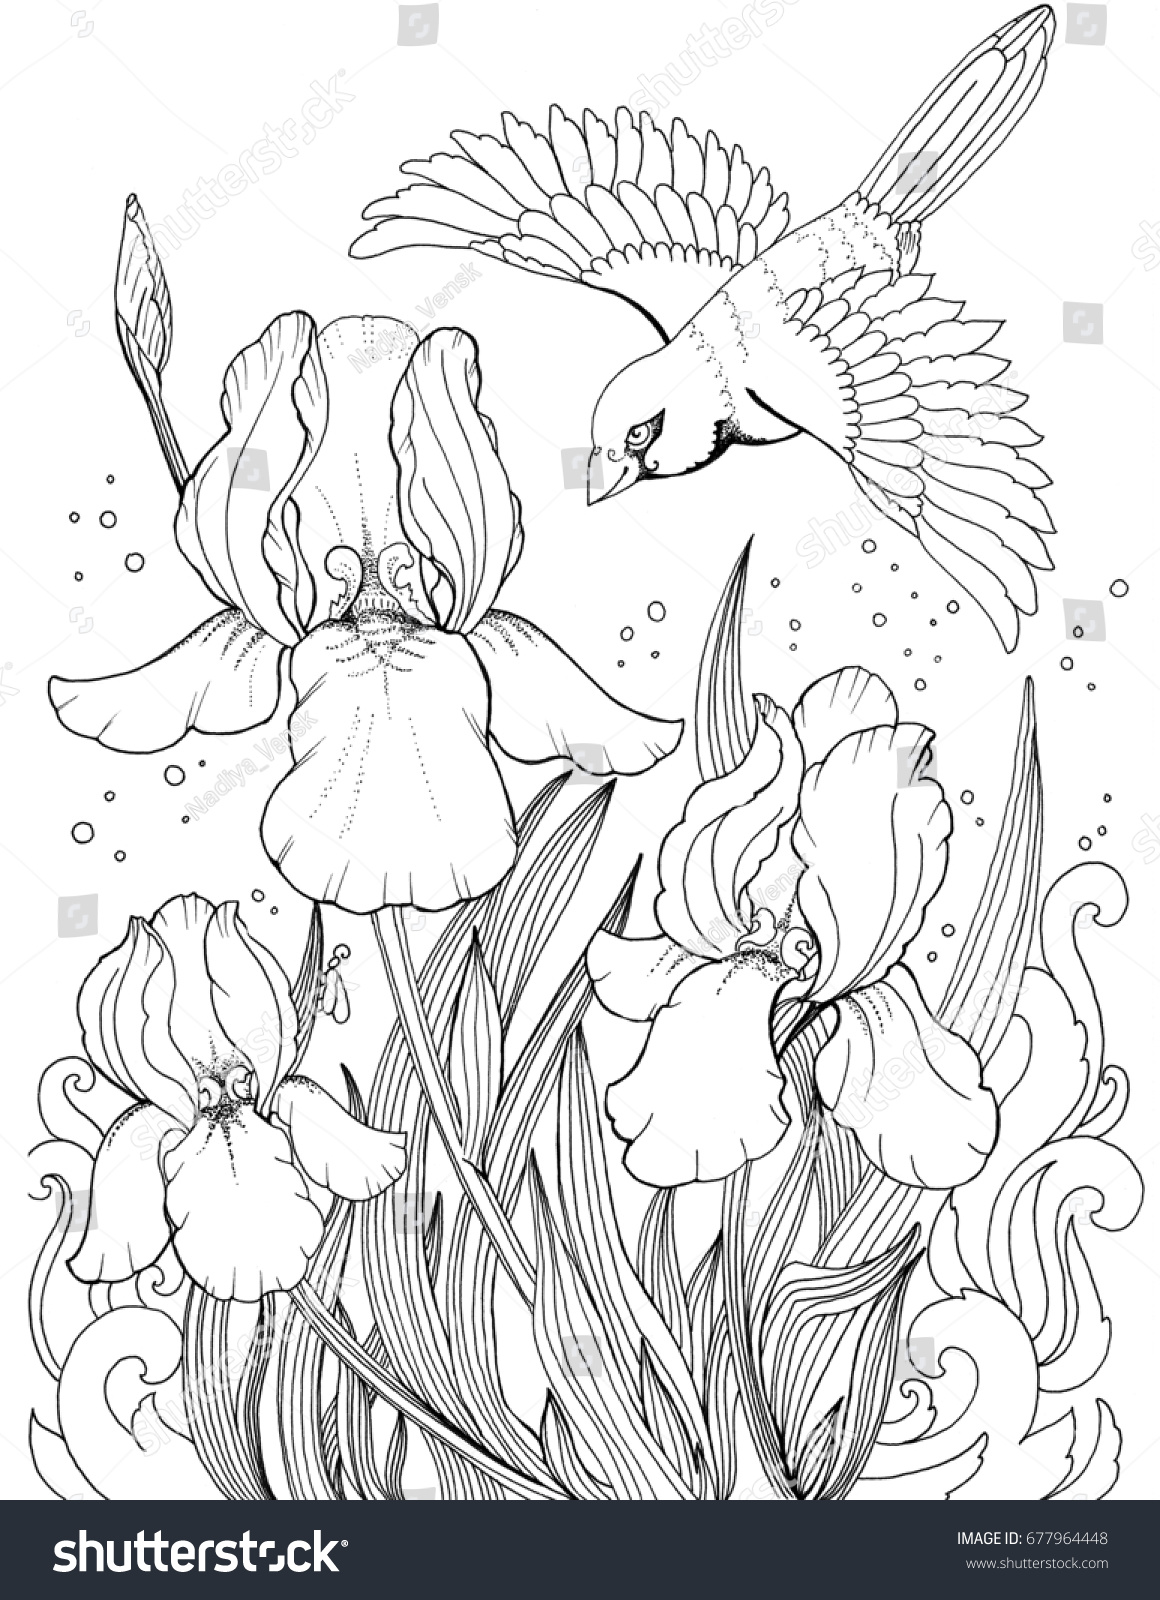 Flying bird over iris flower drawing stock illustration 677964448 flying bird over iris flower drawing of flowers and birds tattoo sketch of izmirmasajfo